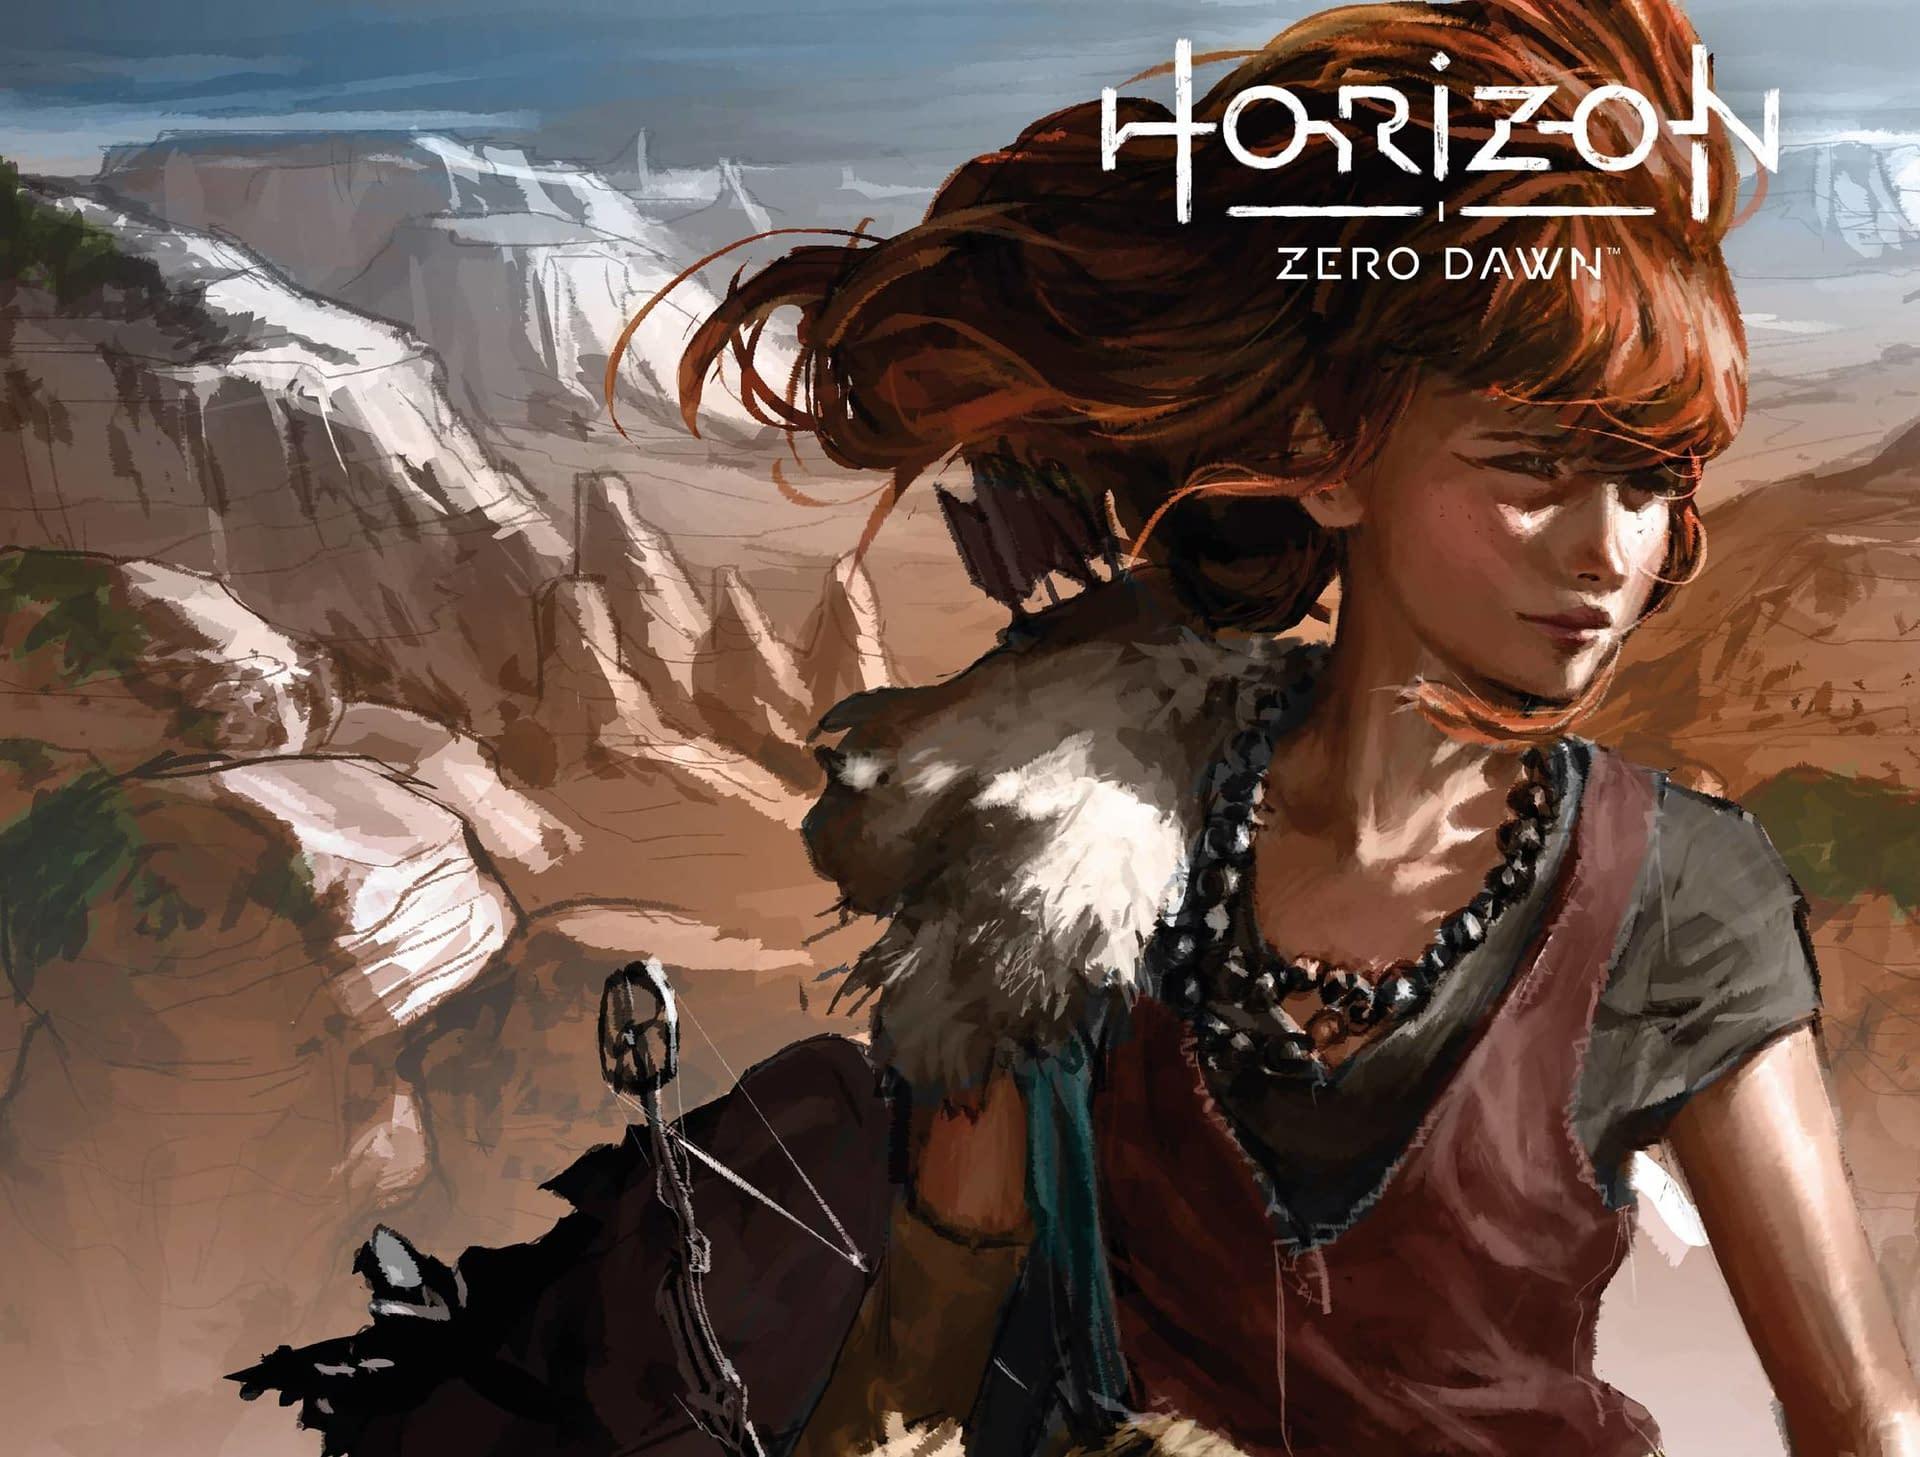 HORIZON ZERO DAWN LIBERATION #1 CVR B GAME ART